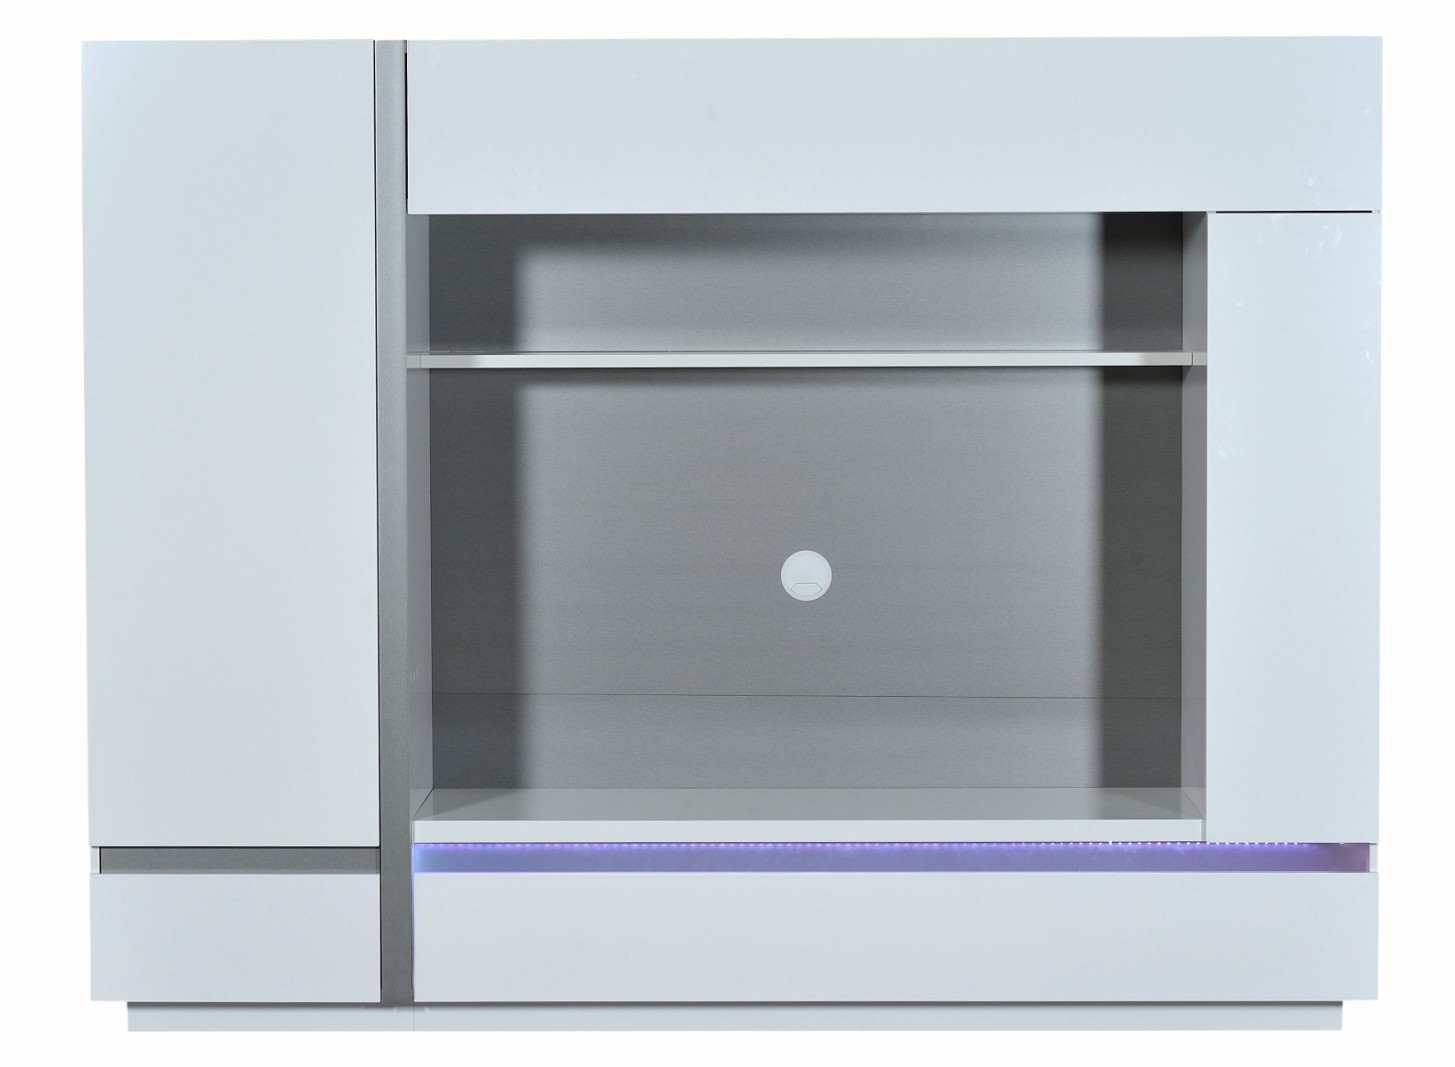 meuble tv laqu blanc lumineux kartz. Black Bedroom Furniture Sets. Home Design Ideas